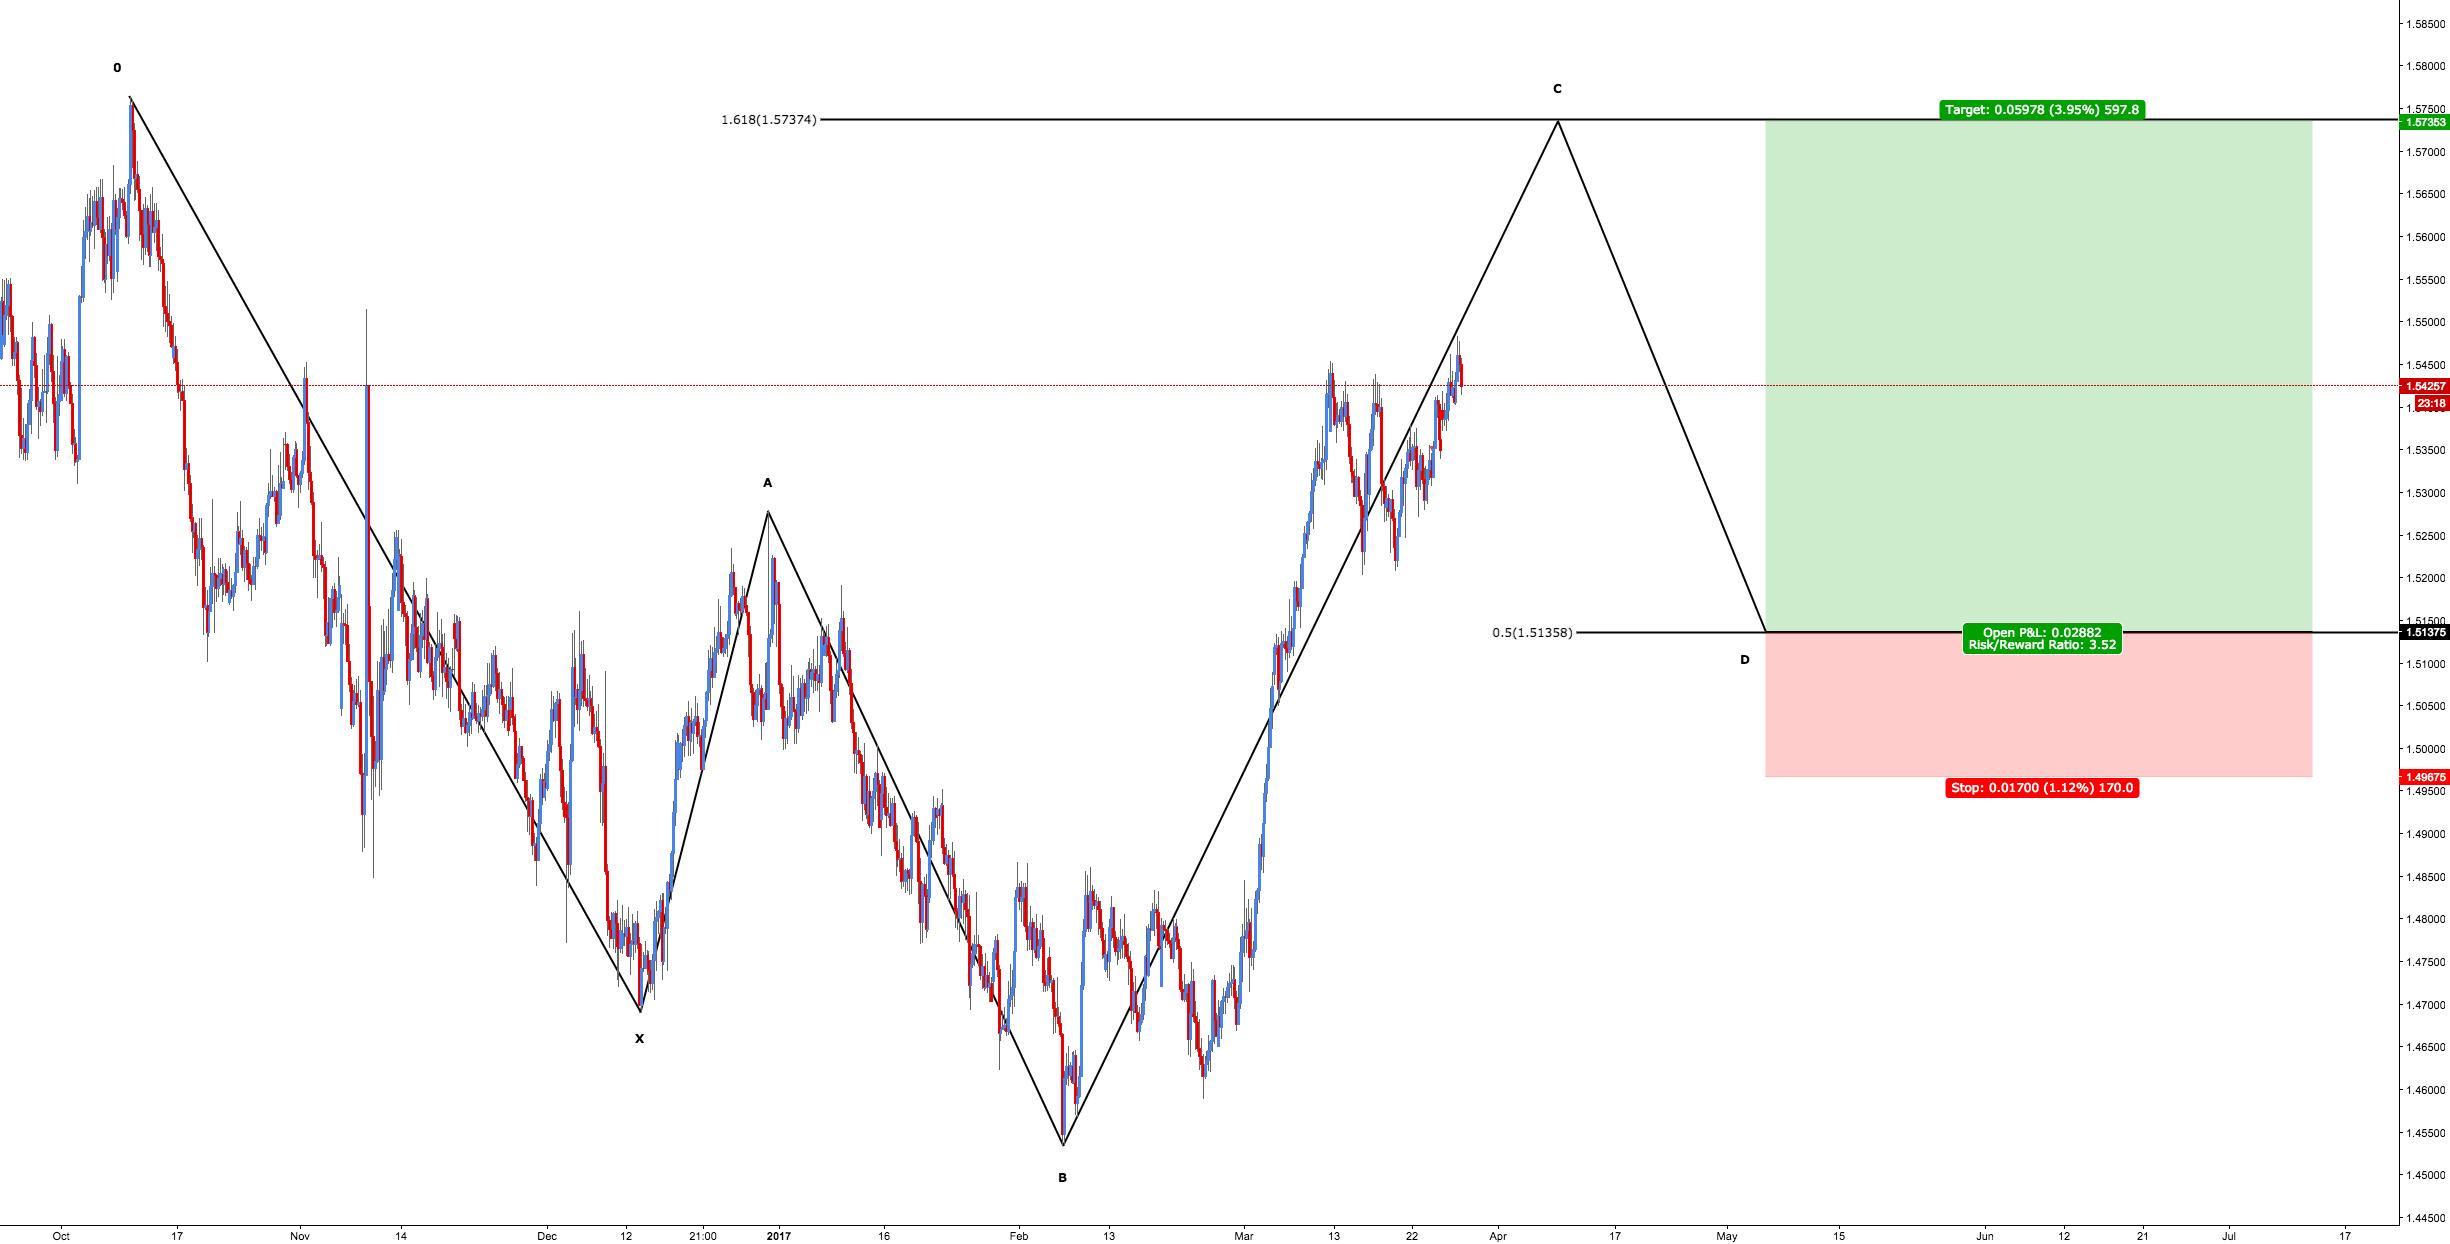 EUR/NZD - Bullish 5-0